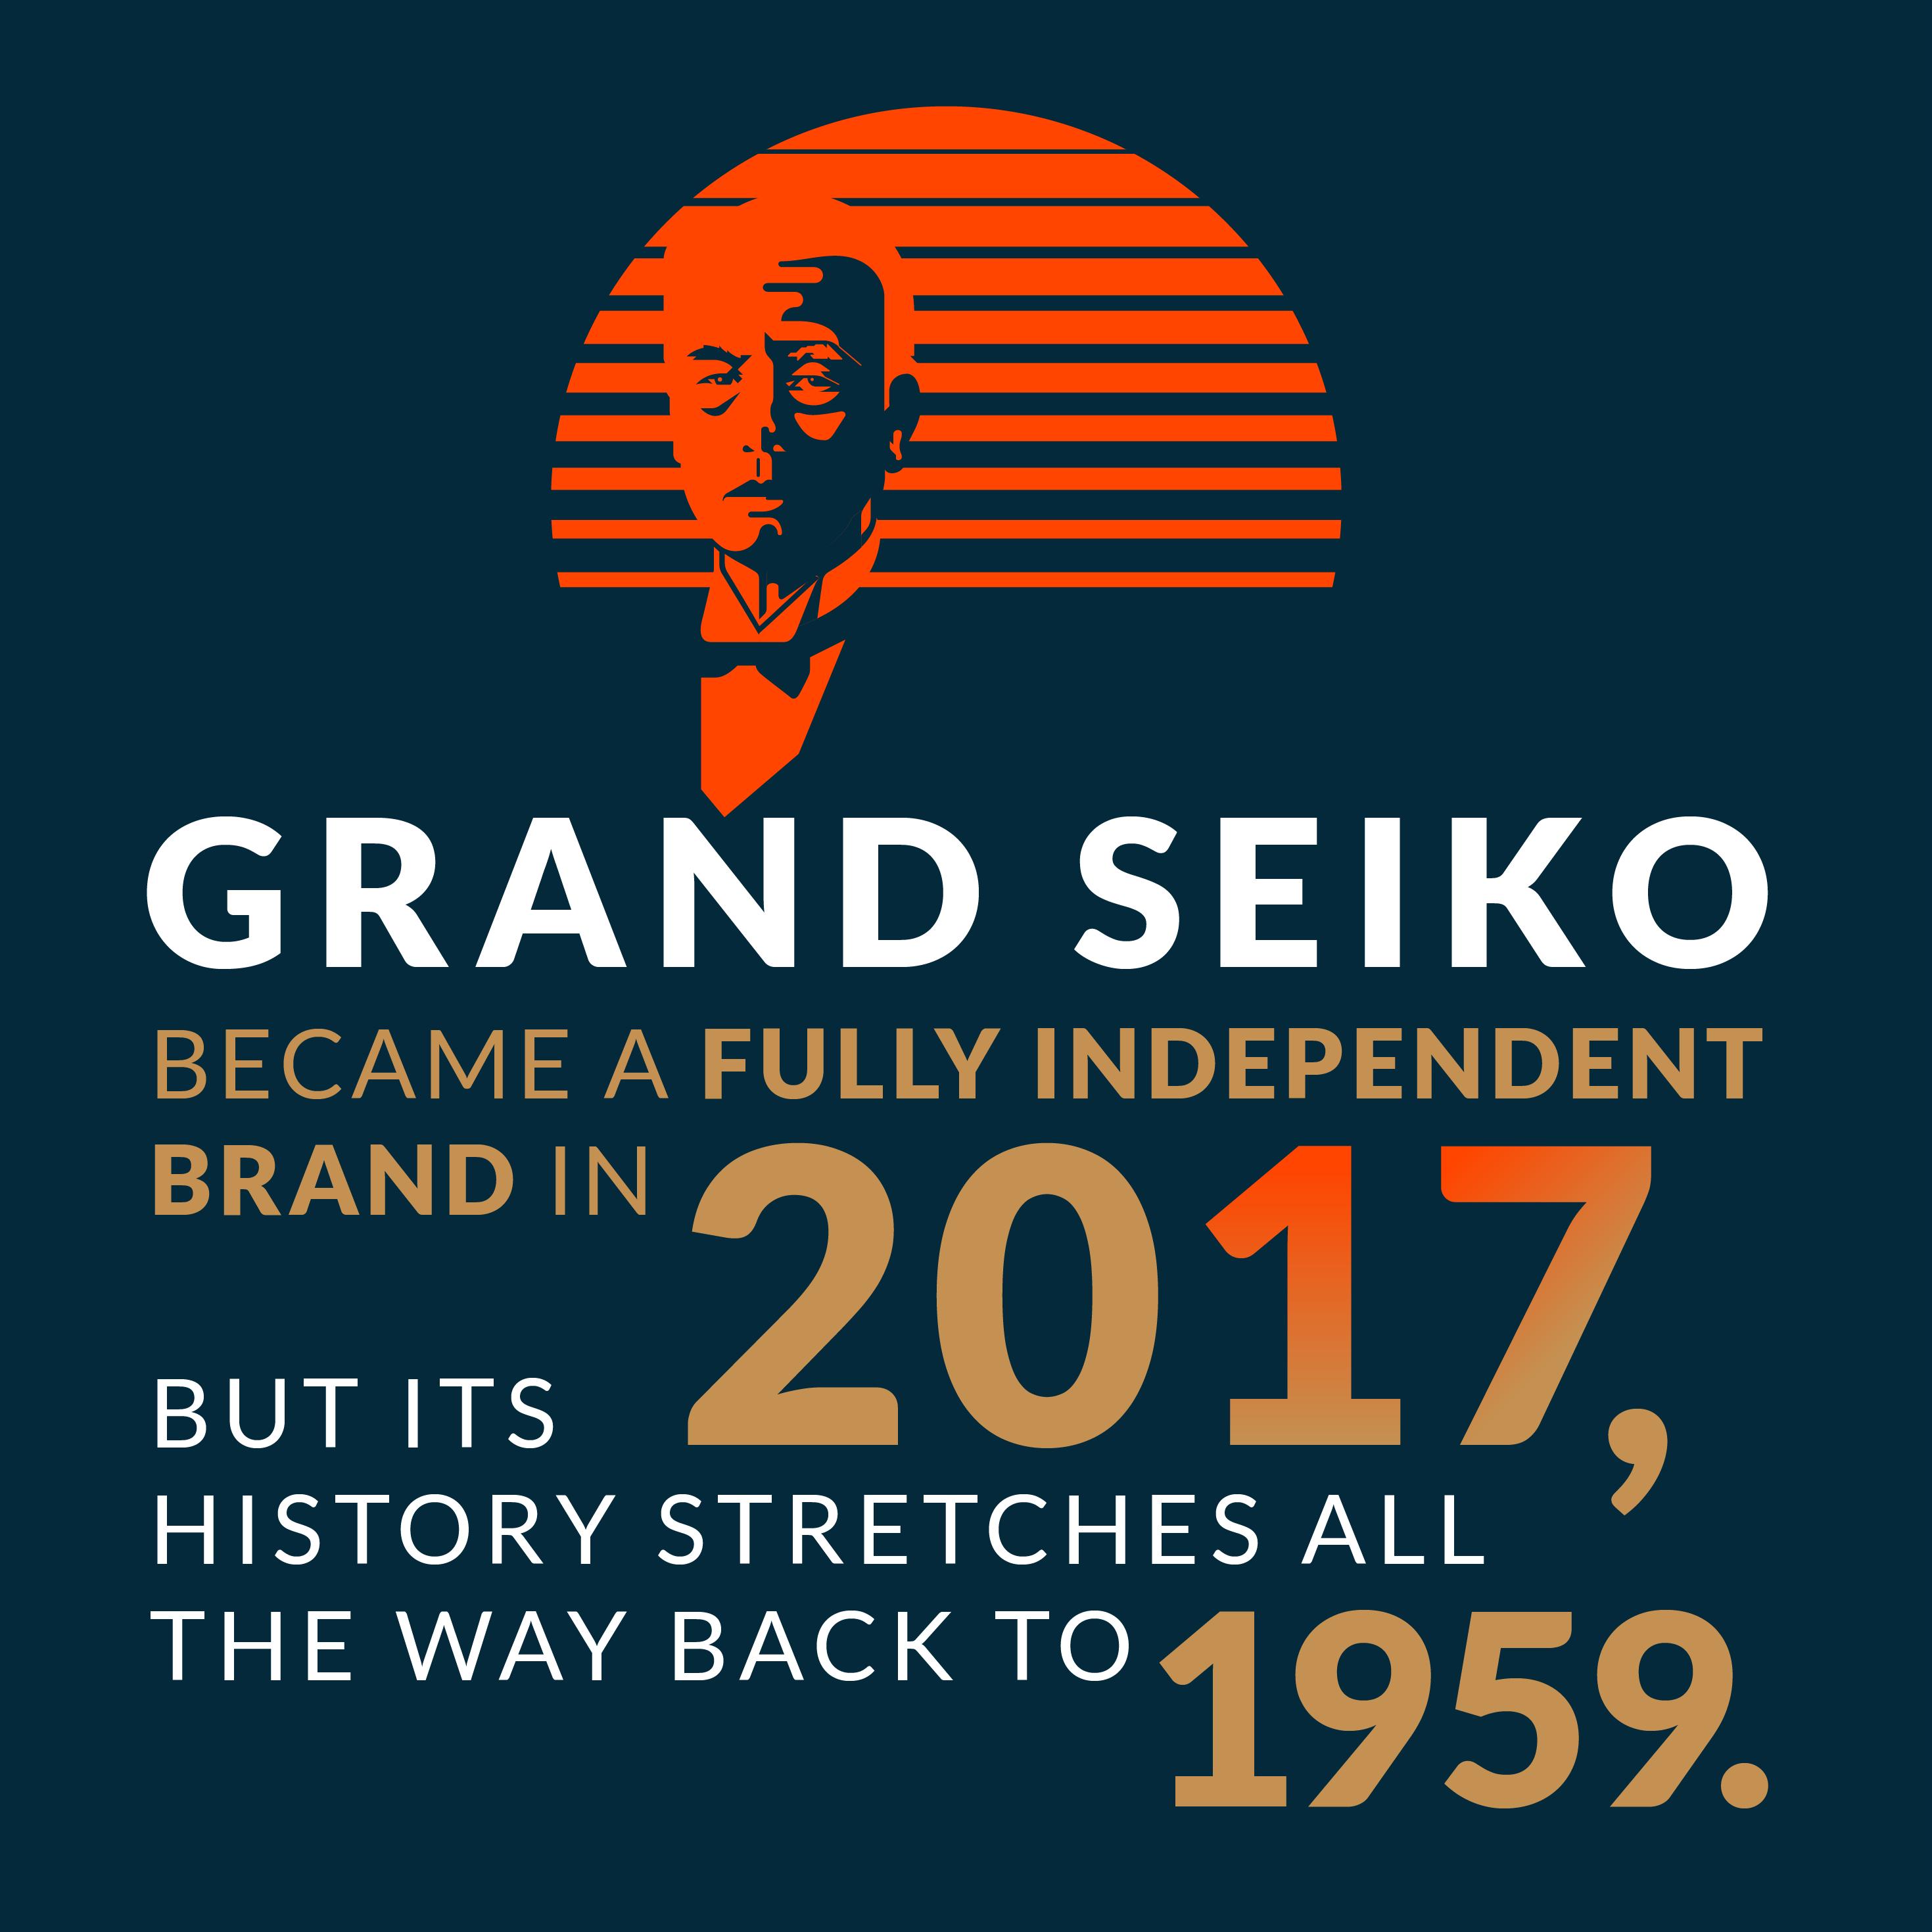 Grand Seiko Infographic